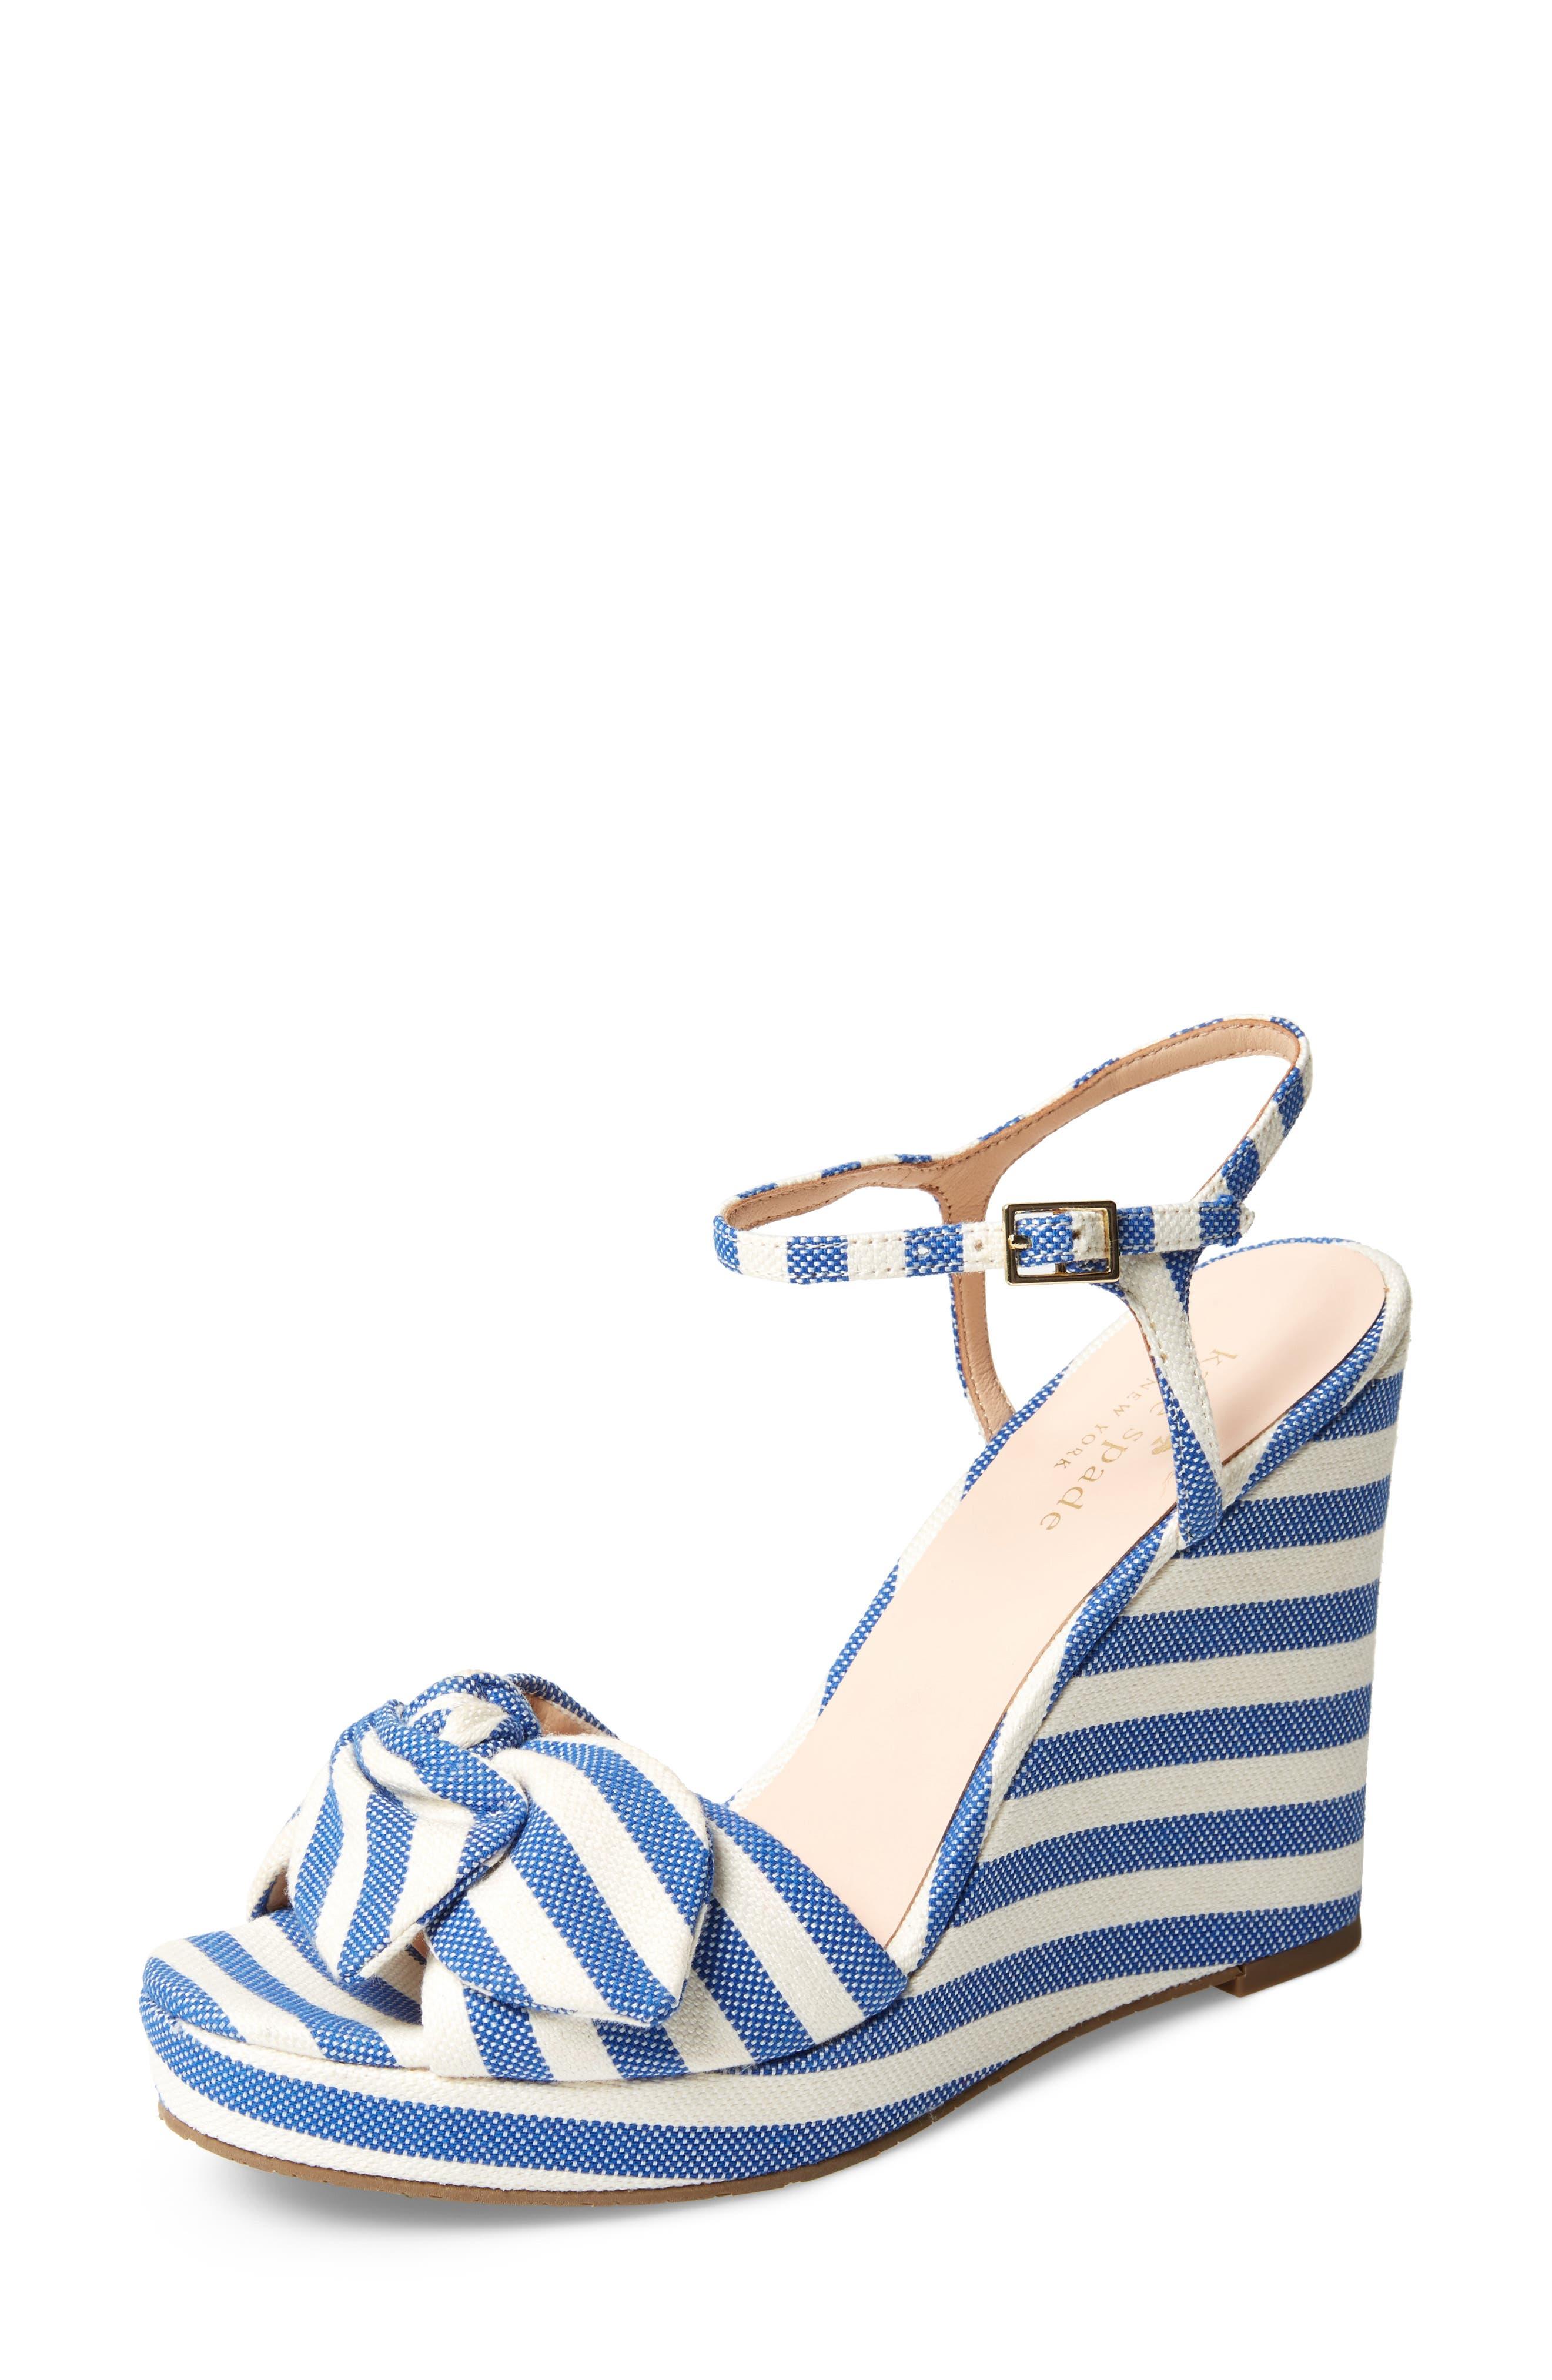 janae knot platform wedge sandal,                             Main thumbnail 1, color,                             Blue/Cream Stripe